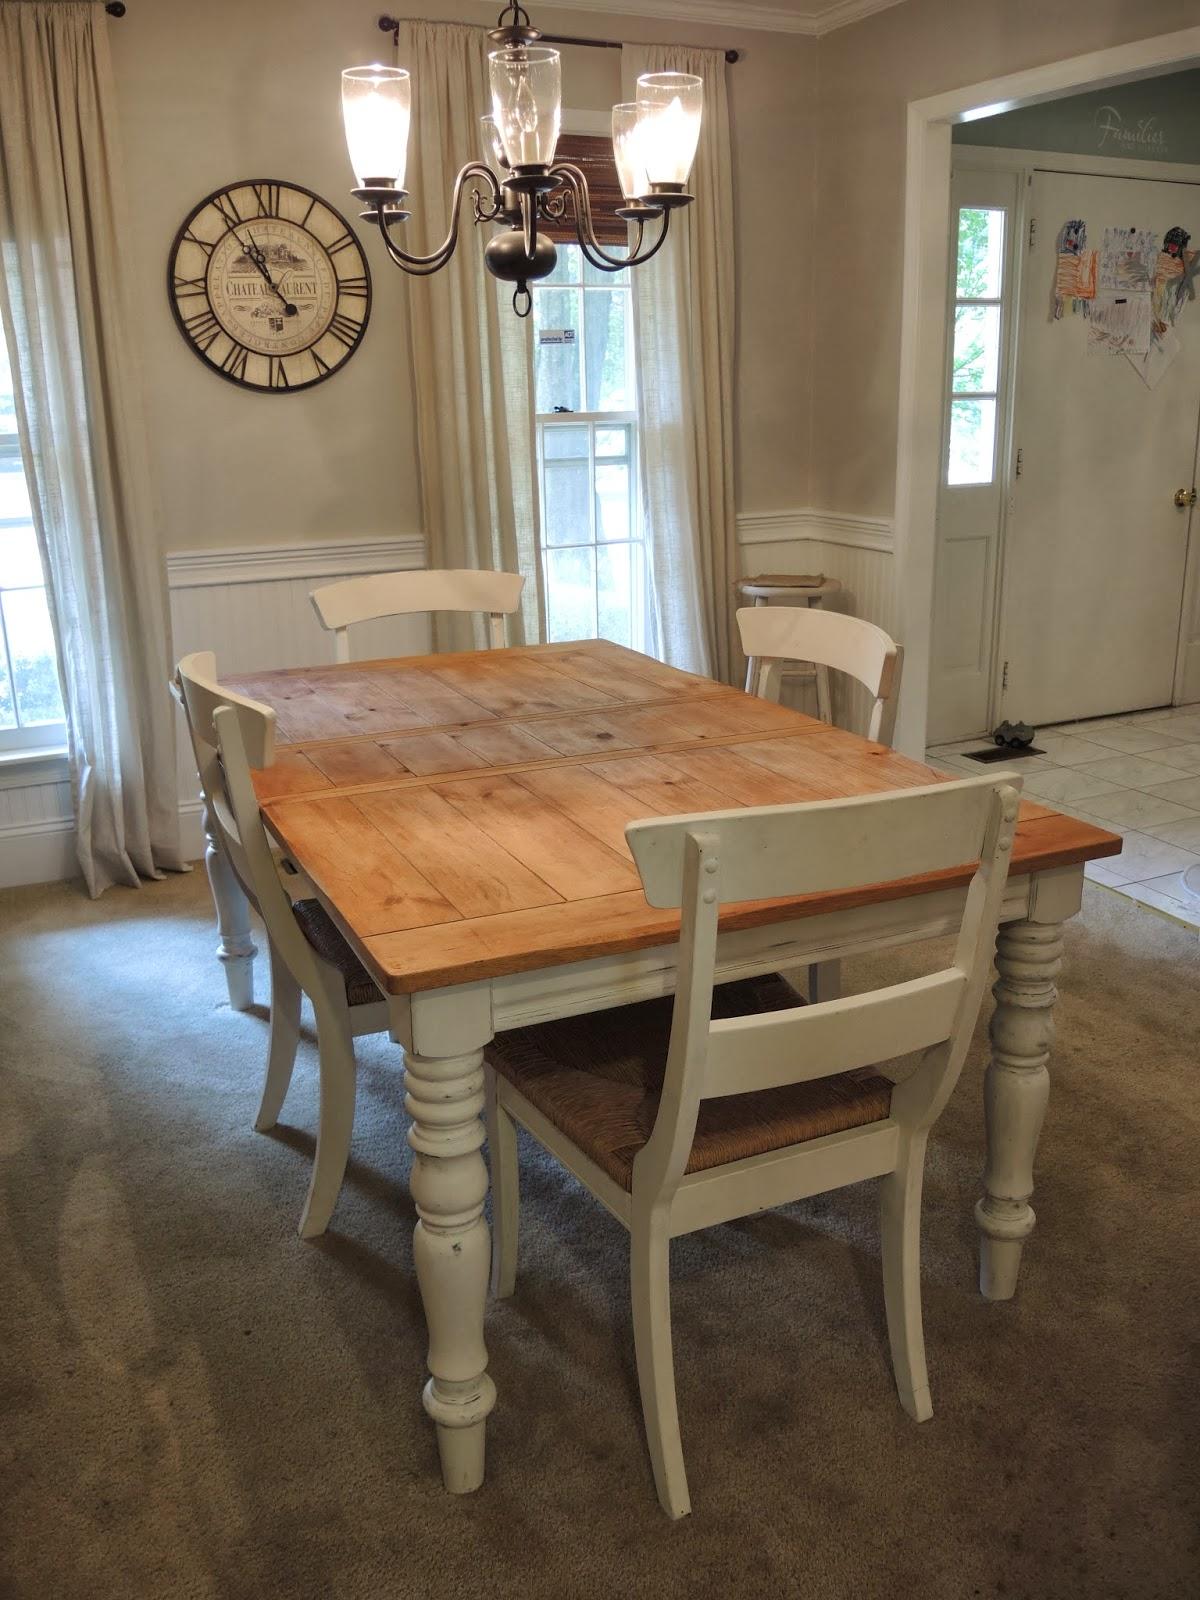 http://www.cmshawstudios.blogspot.com/2013/09/danas-table-and-year-of-dining-room.html